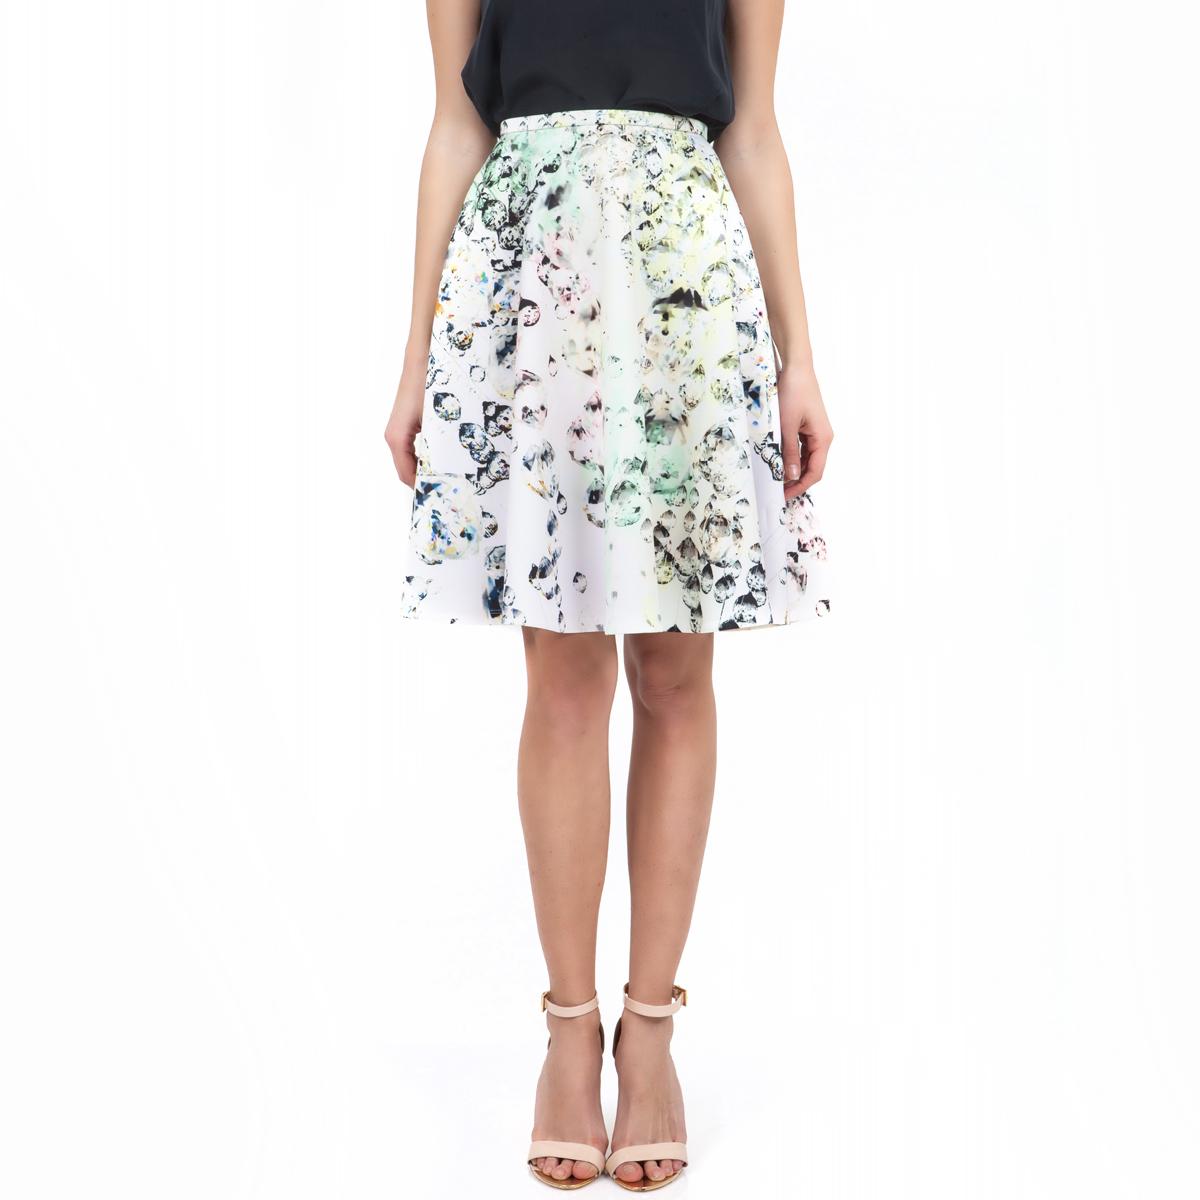 TED BAKER - Γυναικεία φούστα Ted Baker λευκή γυναικεία ρούχα φούστες μέχρι το γόνατο